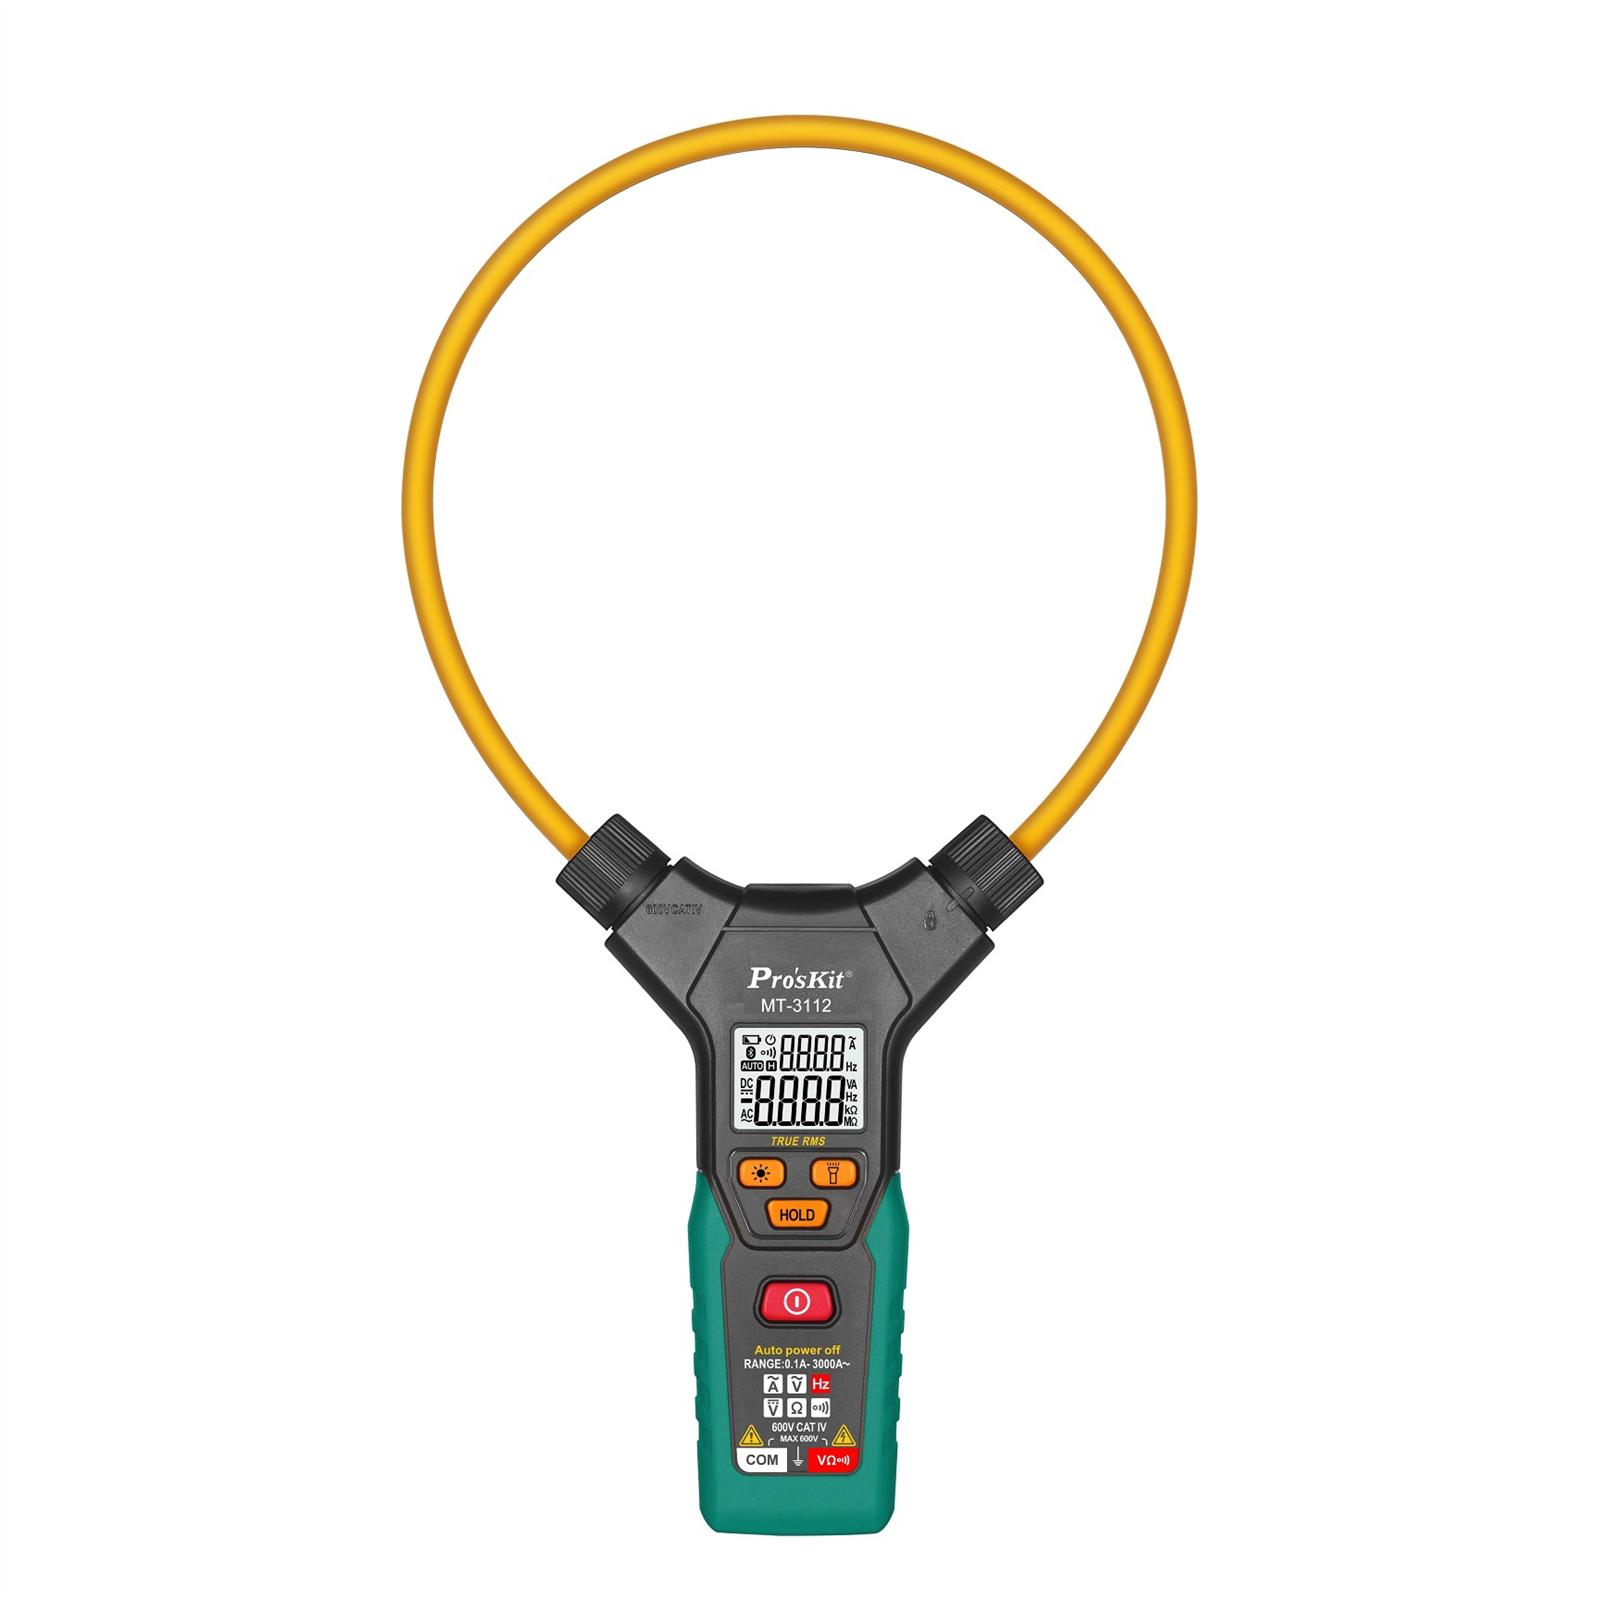 Ampe kẹp dòng điện tử TrueRMS Pro'skit MT-3112